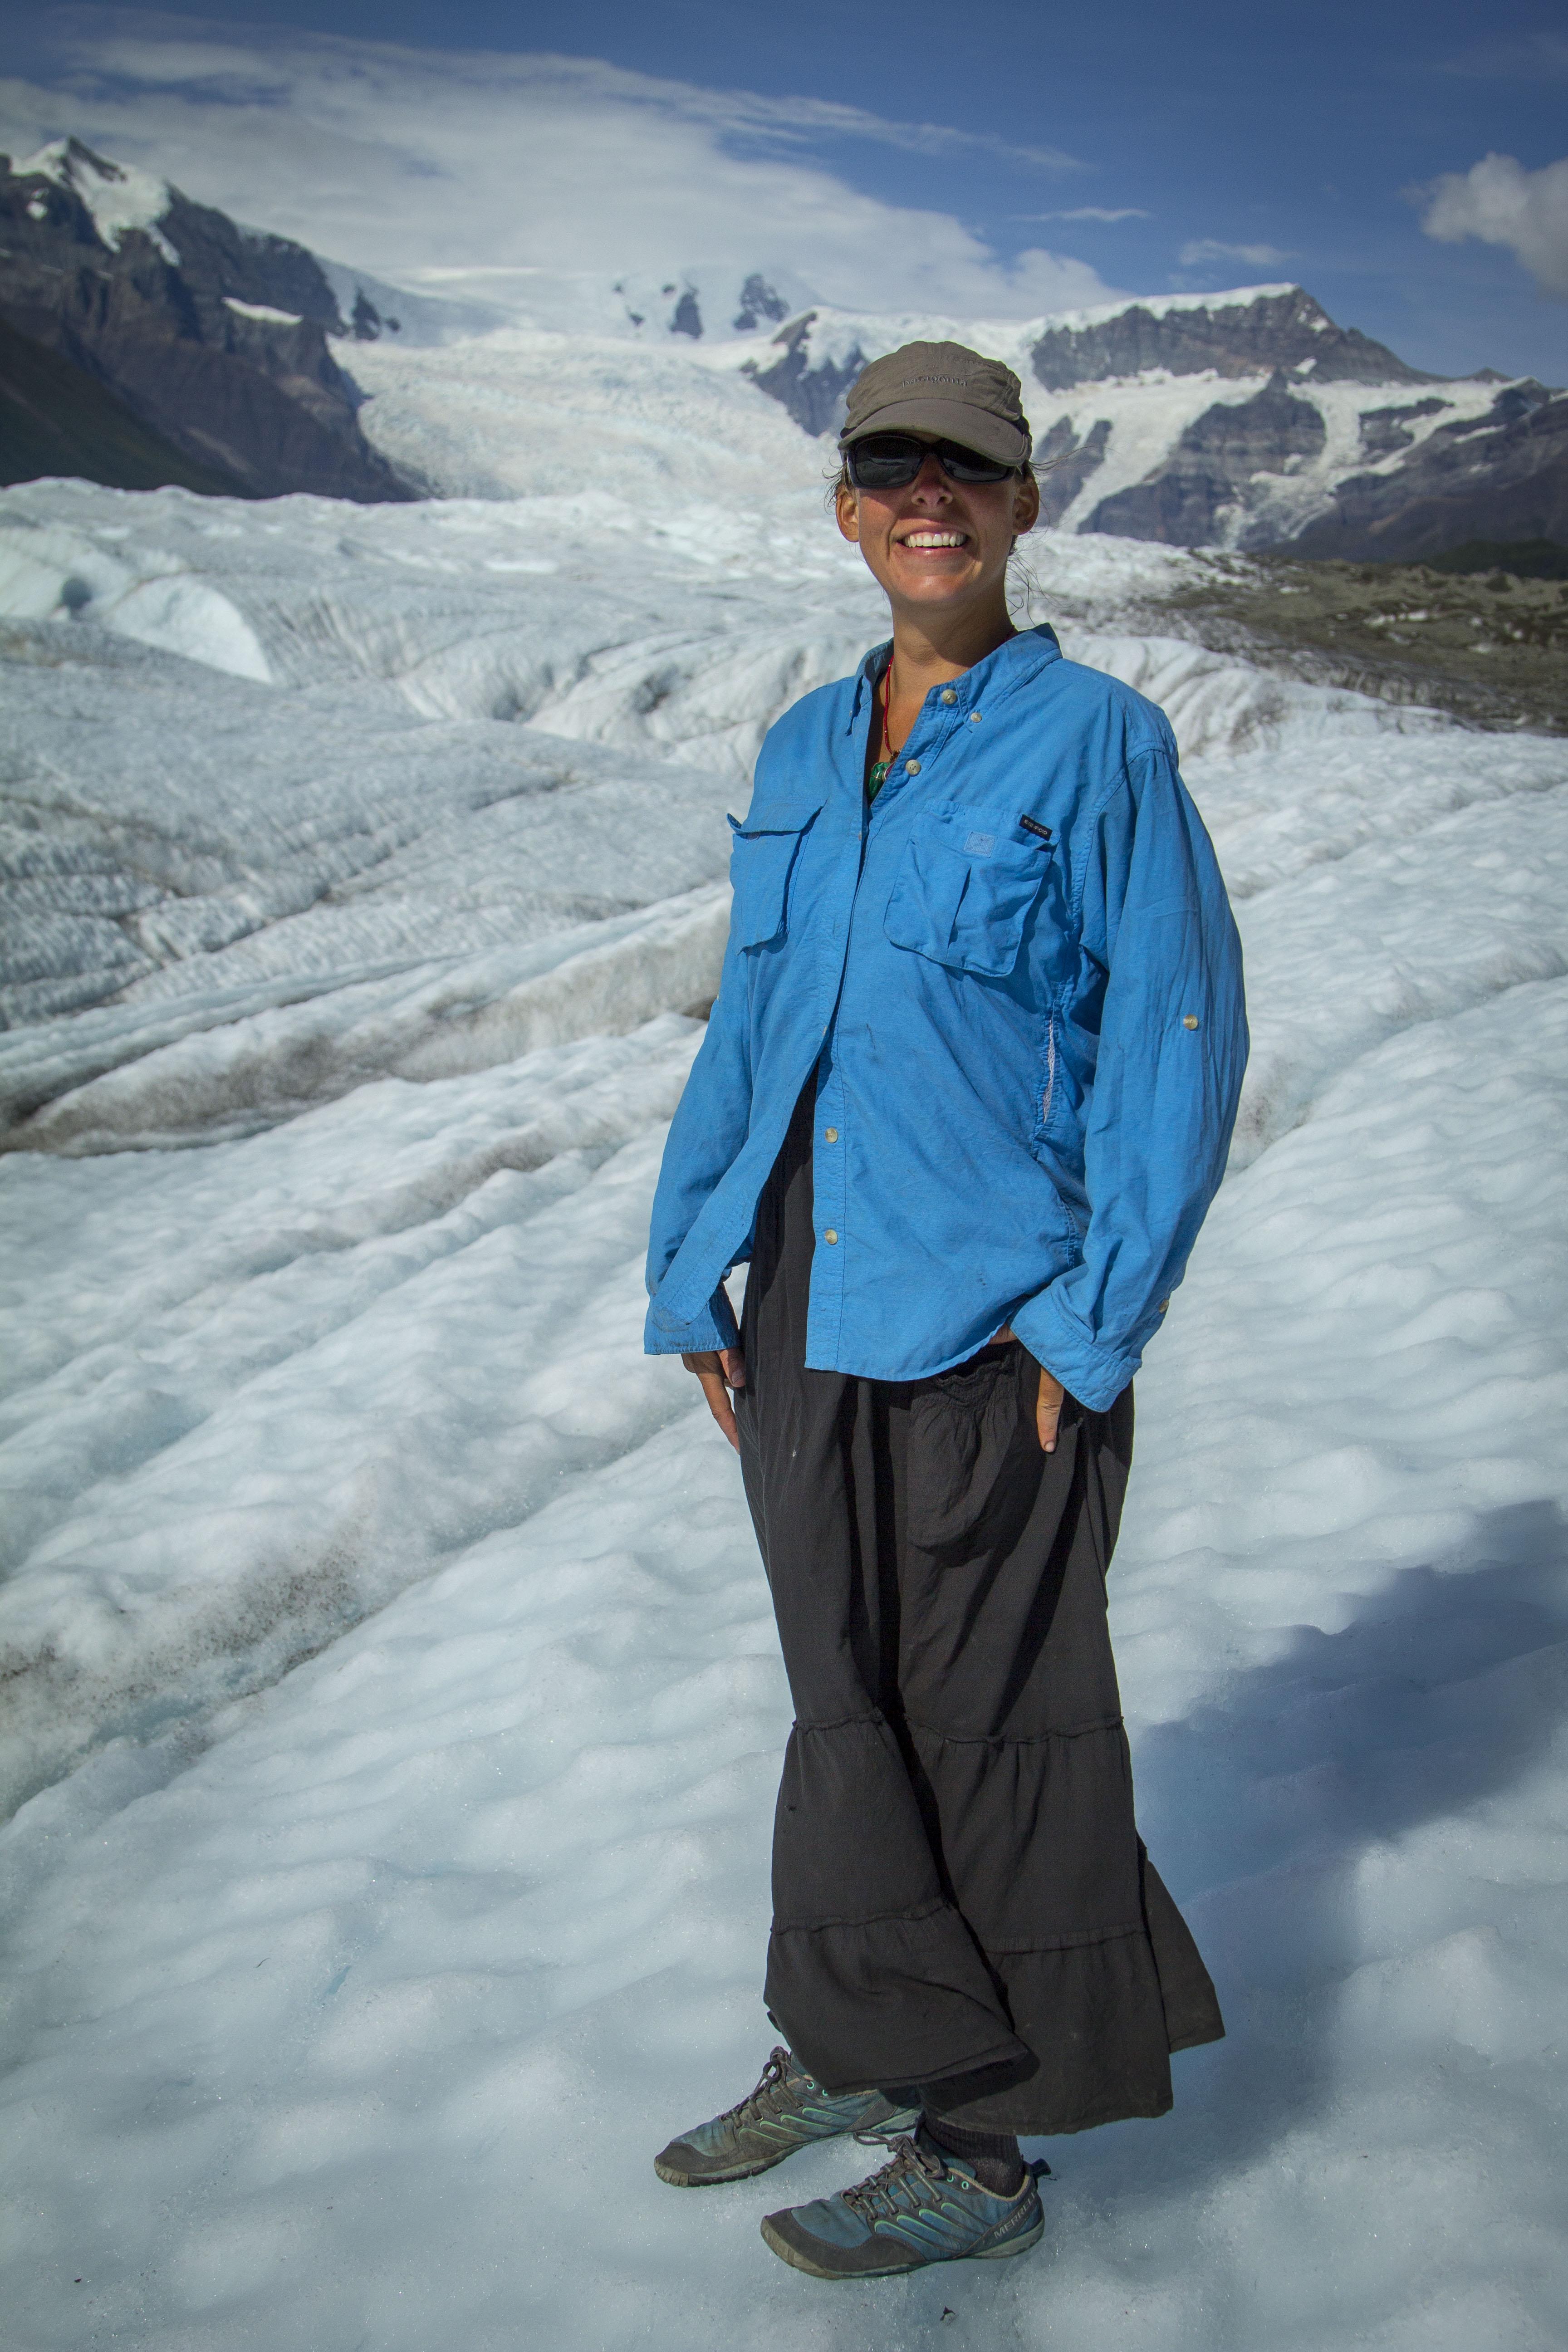 Angela on the Root Glacier